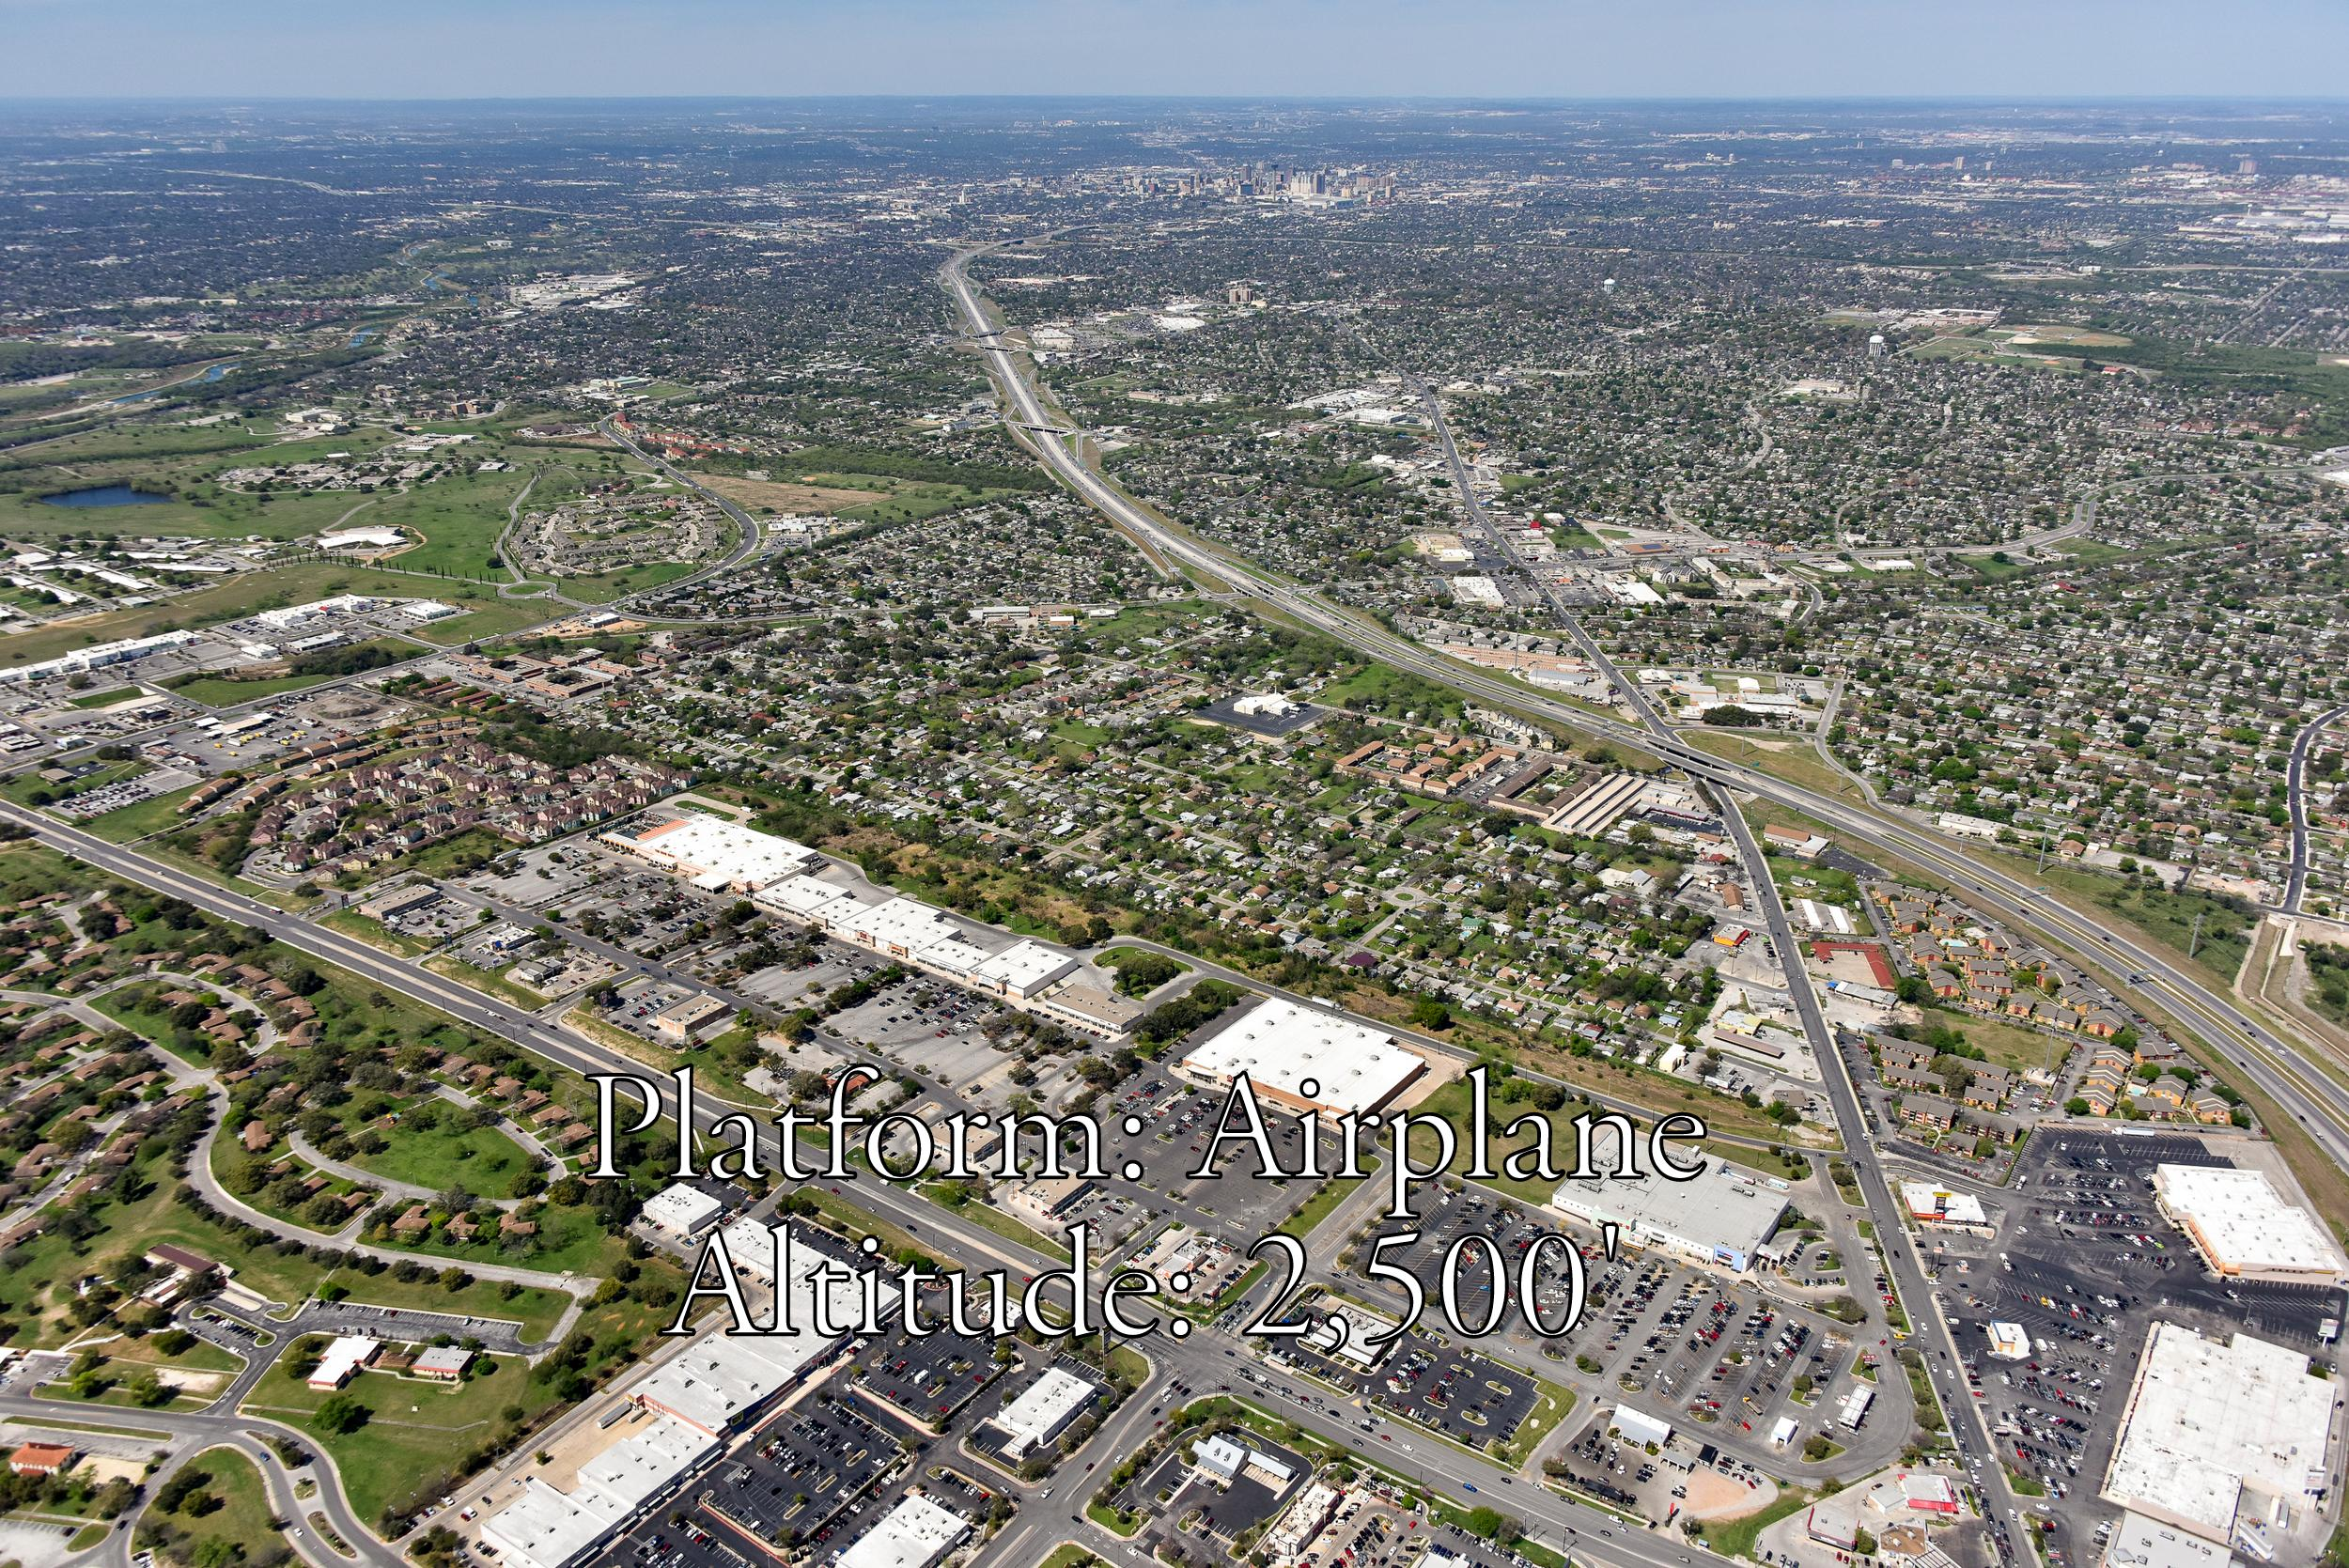 san-antonio-texas-aerial-photographer-drone-photo-image-tx-airplane-2500